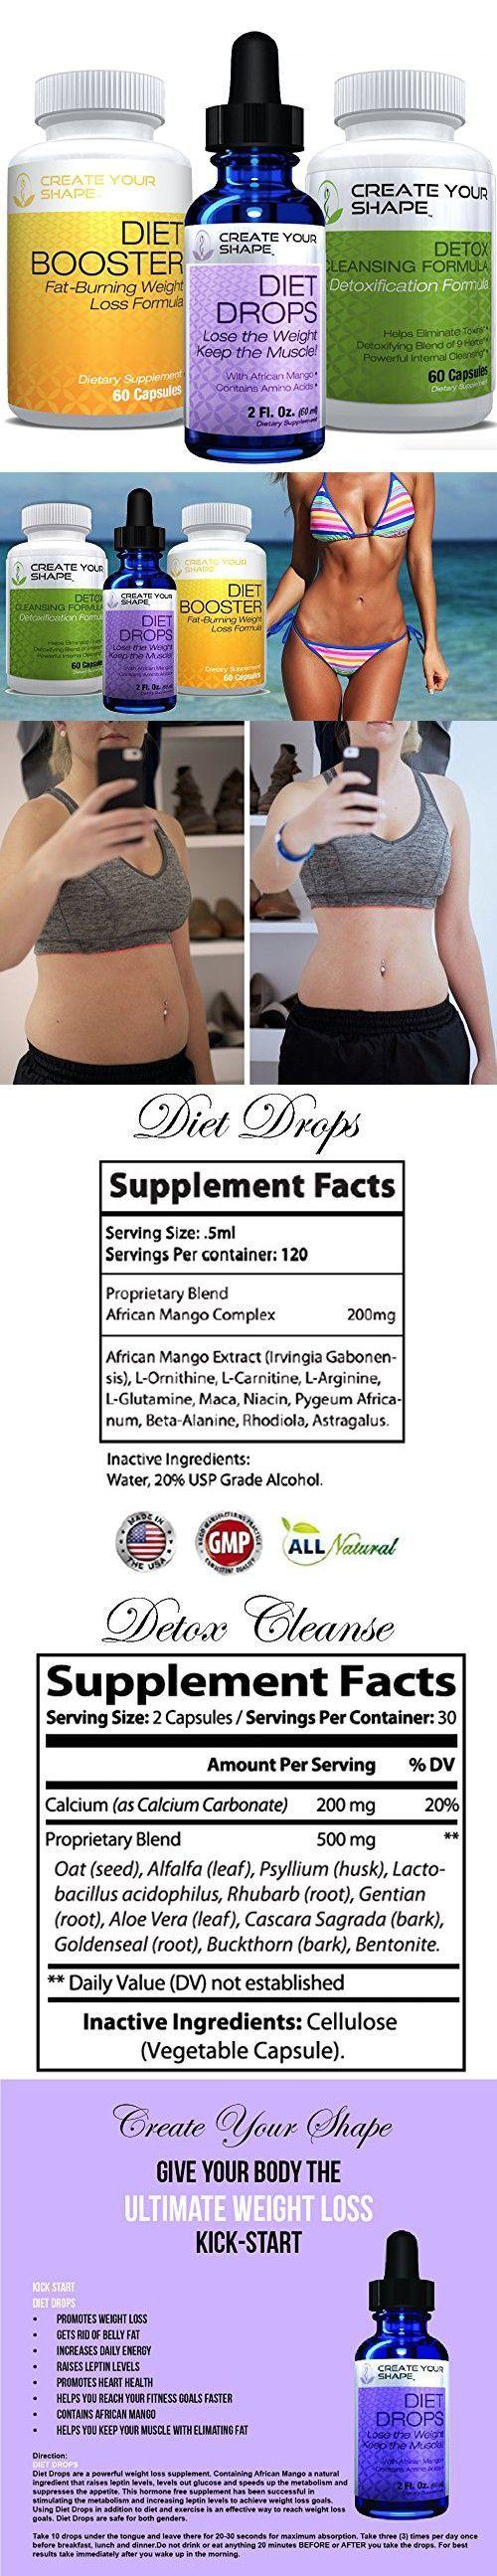 Diet Booster Diet Pills + Detox Cleanse + Diet Drops - 3 Pack - Lose Weight - Amino Acids - Appetite Suppressant - Lose Belly Fat - Weight Loss Pills - FAST Weight Loss #bellyfatburnerpills